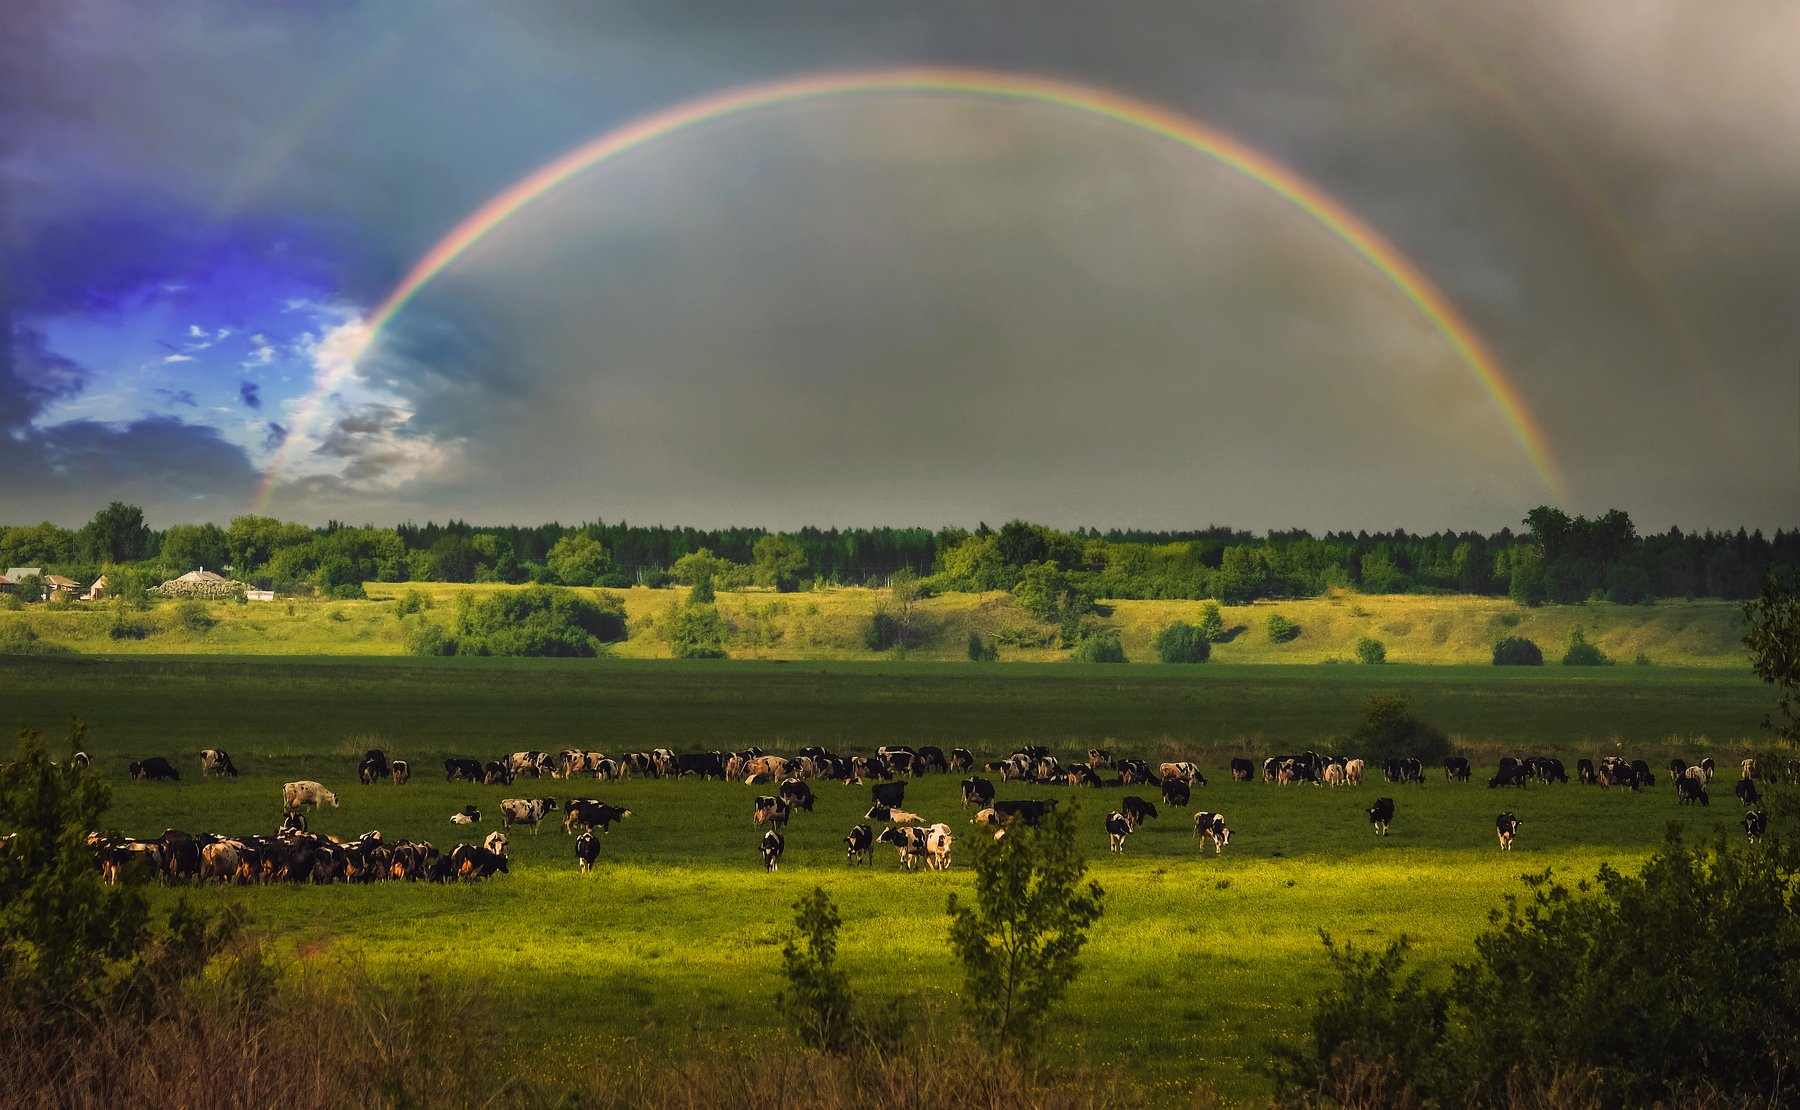 фото, природа, деревня, лес, весна, гроза, радуга, коровы, Екатерина